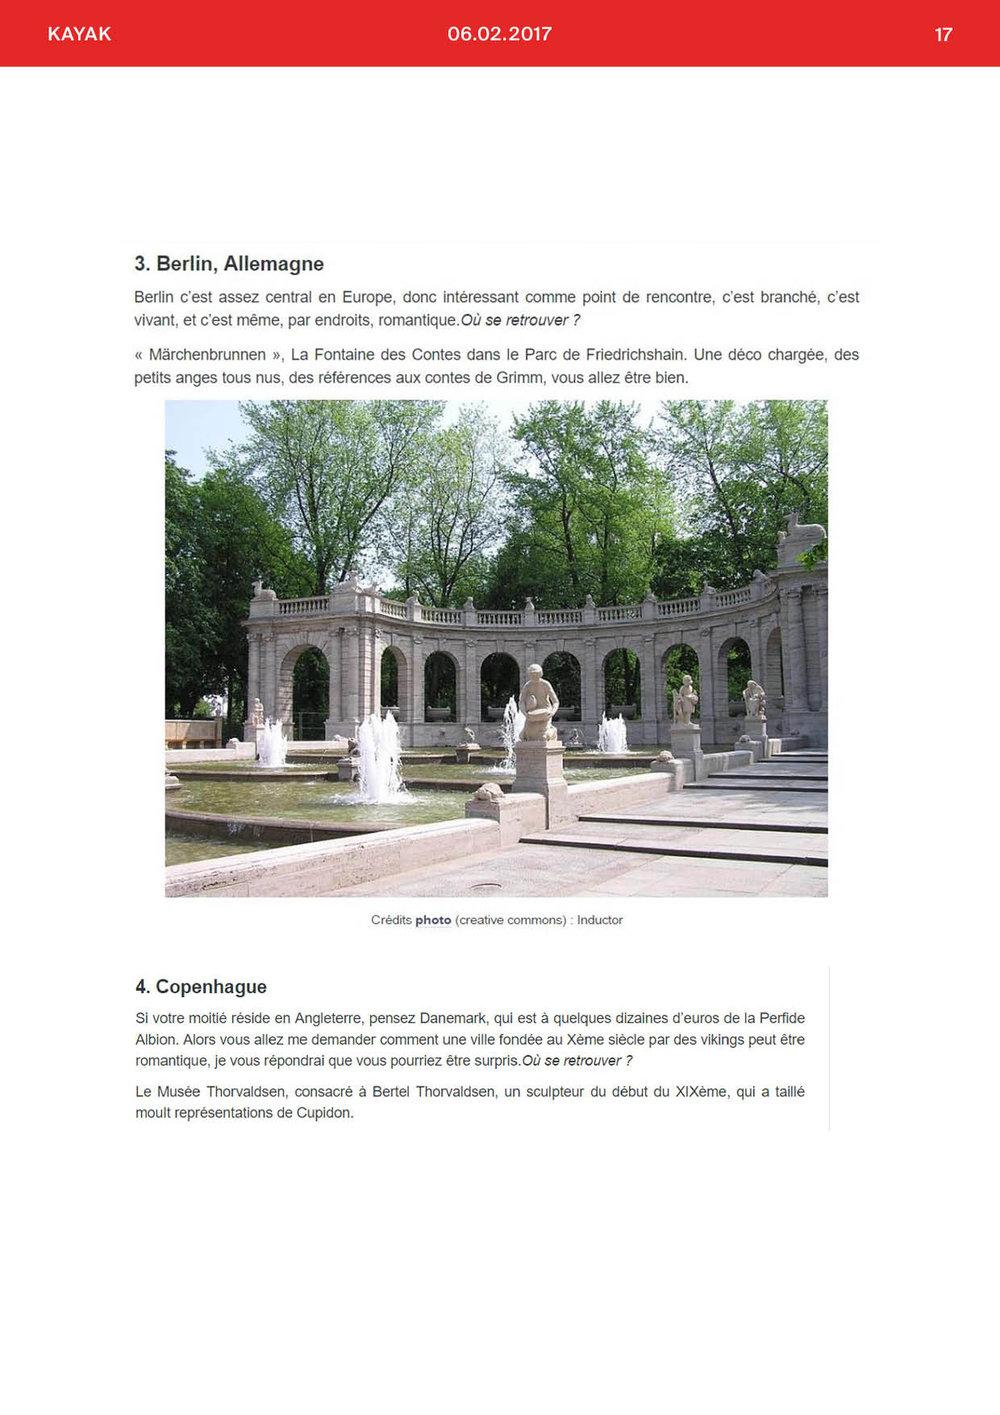 BOOKMEDIA_FEV17.jpg